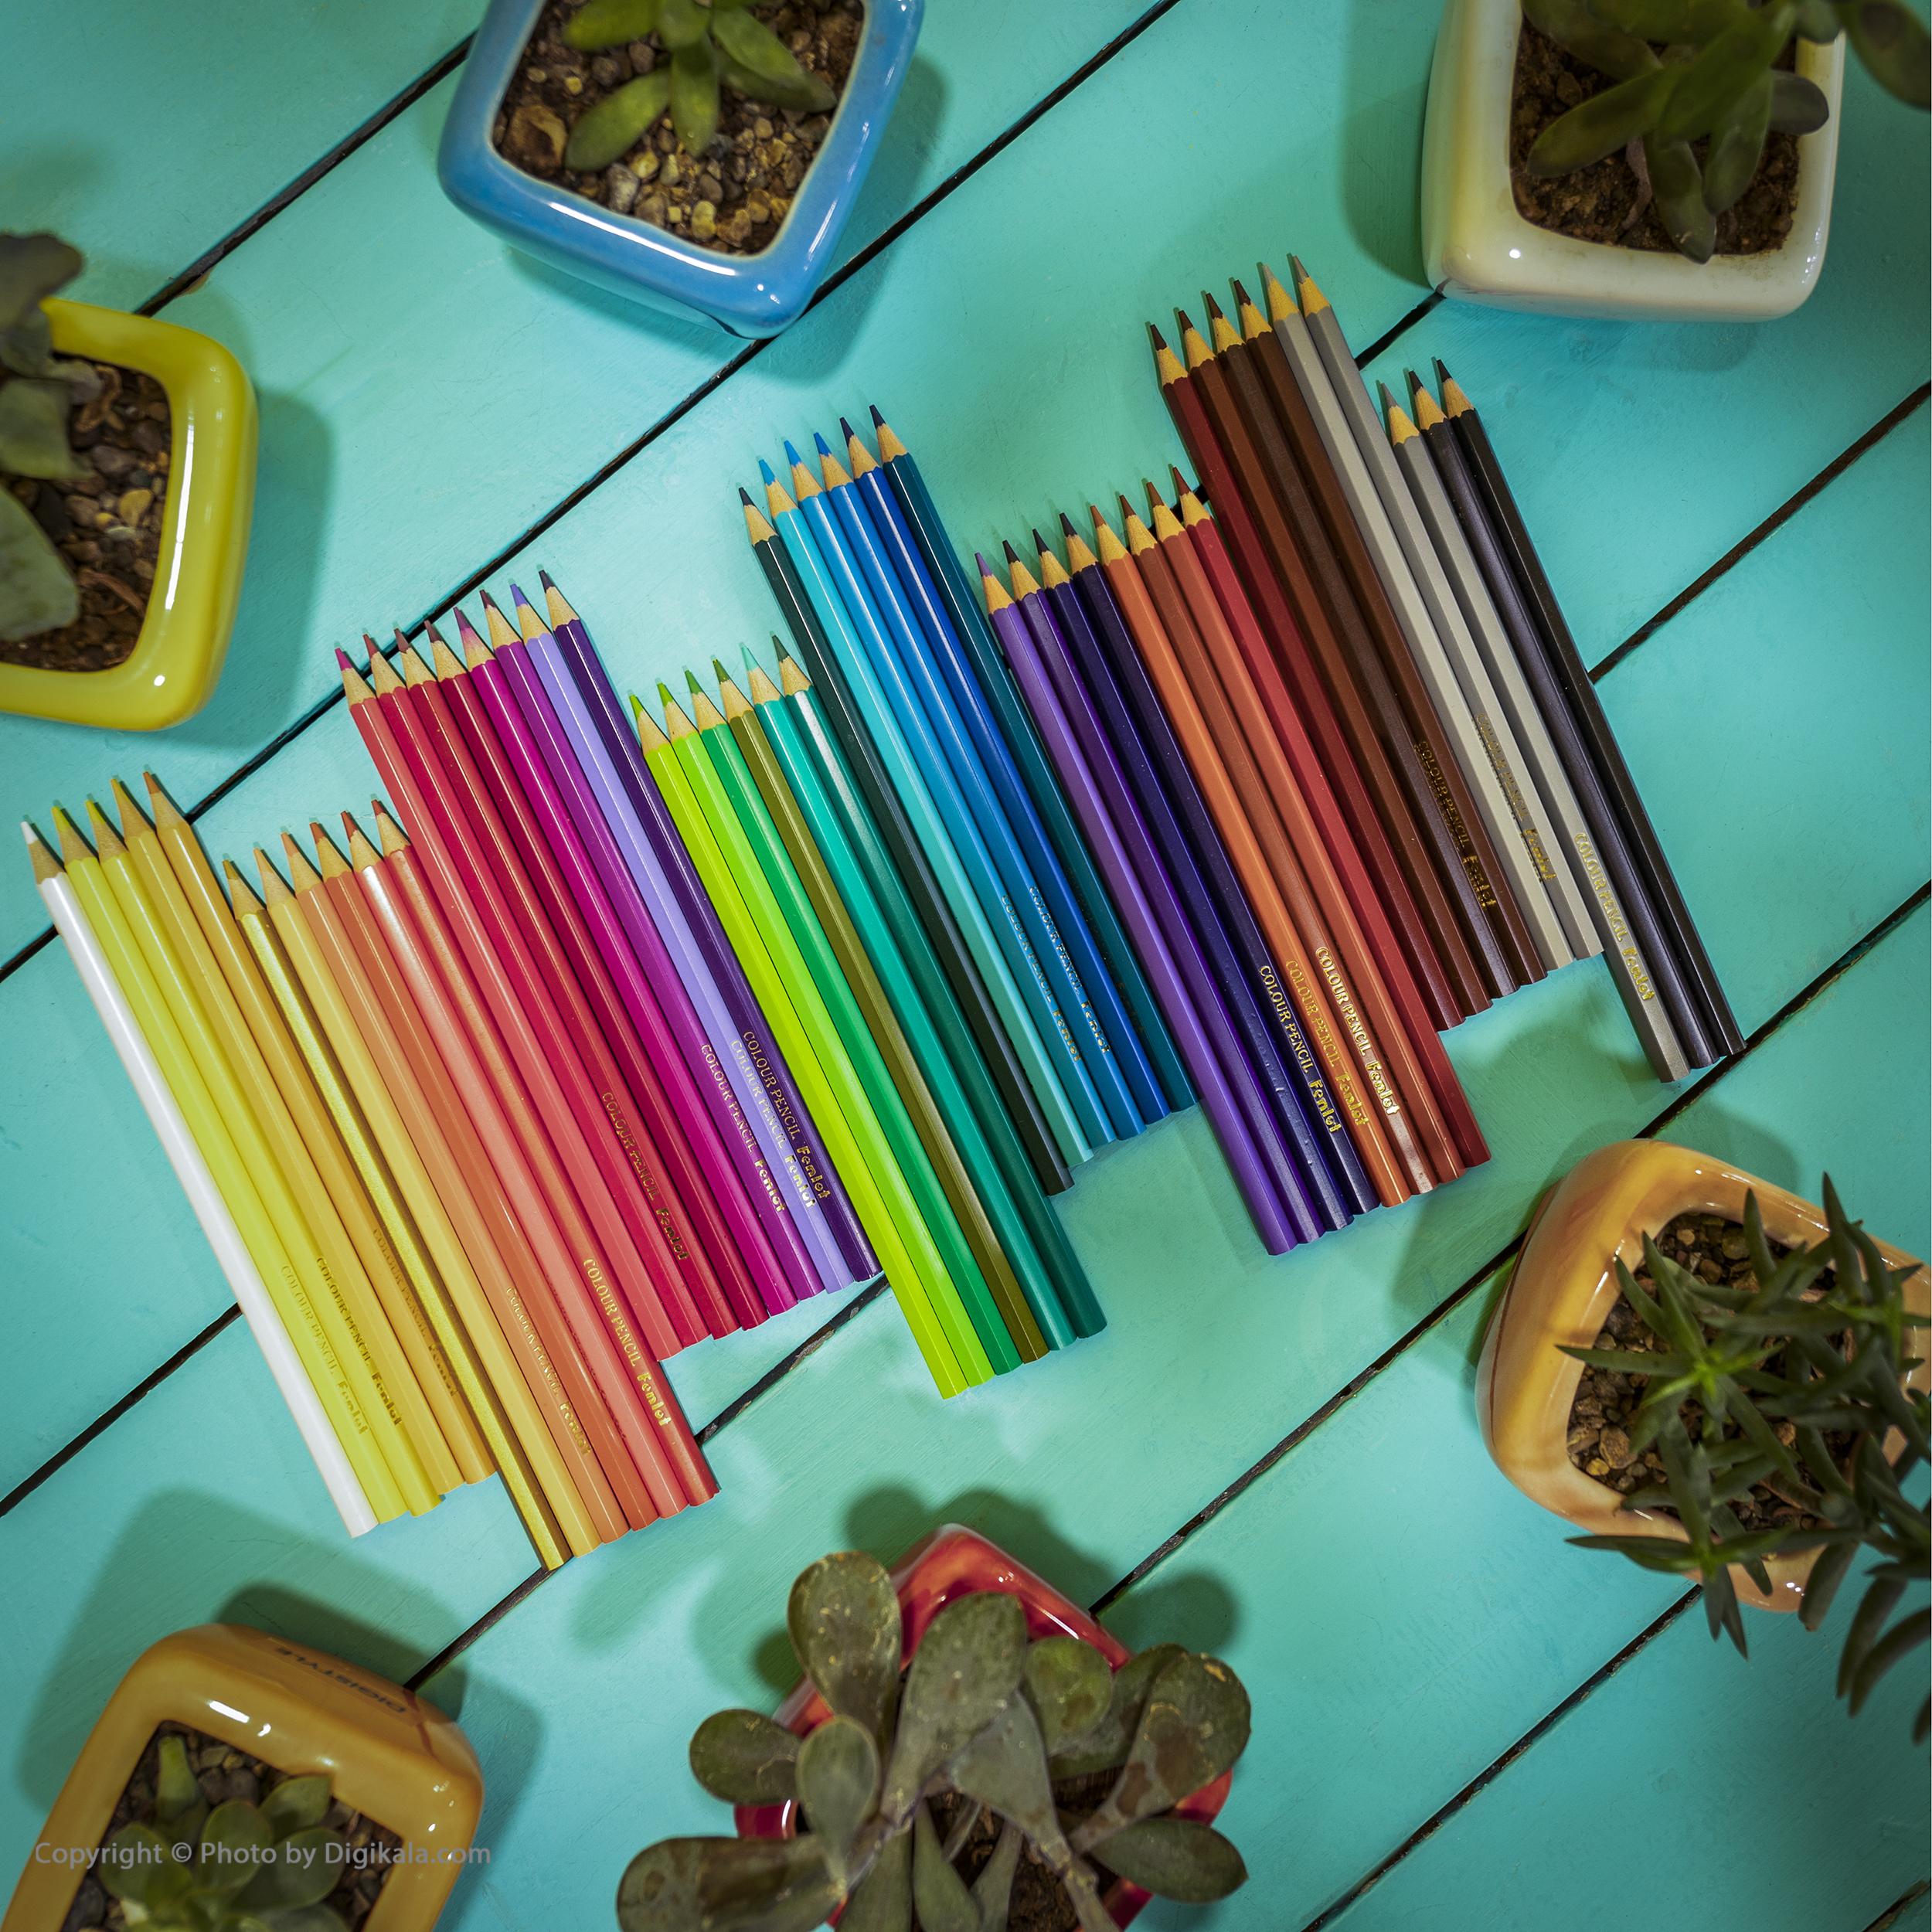 مداد رنگی 48 رنگ فنلوت مدل COLOR-48 main 1 6